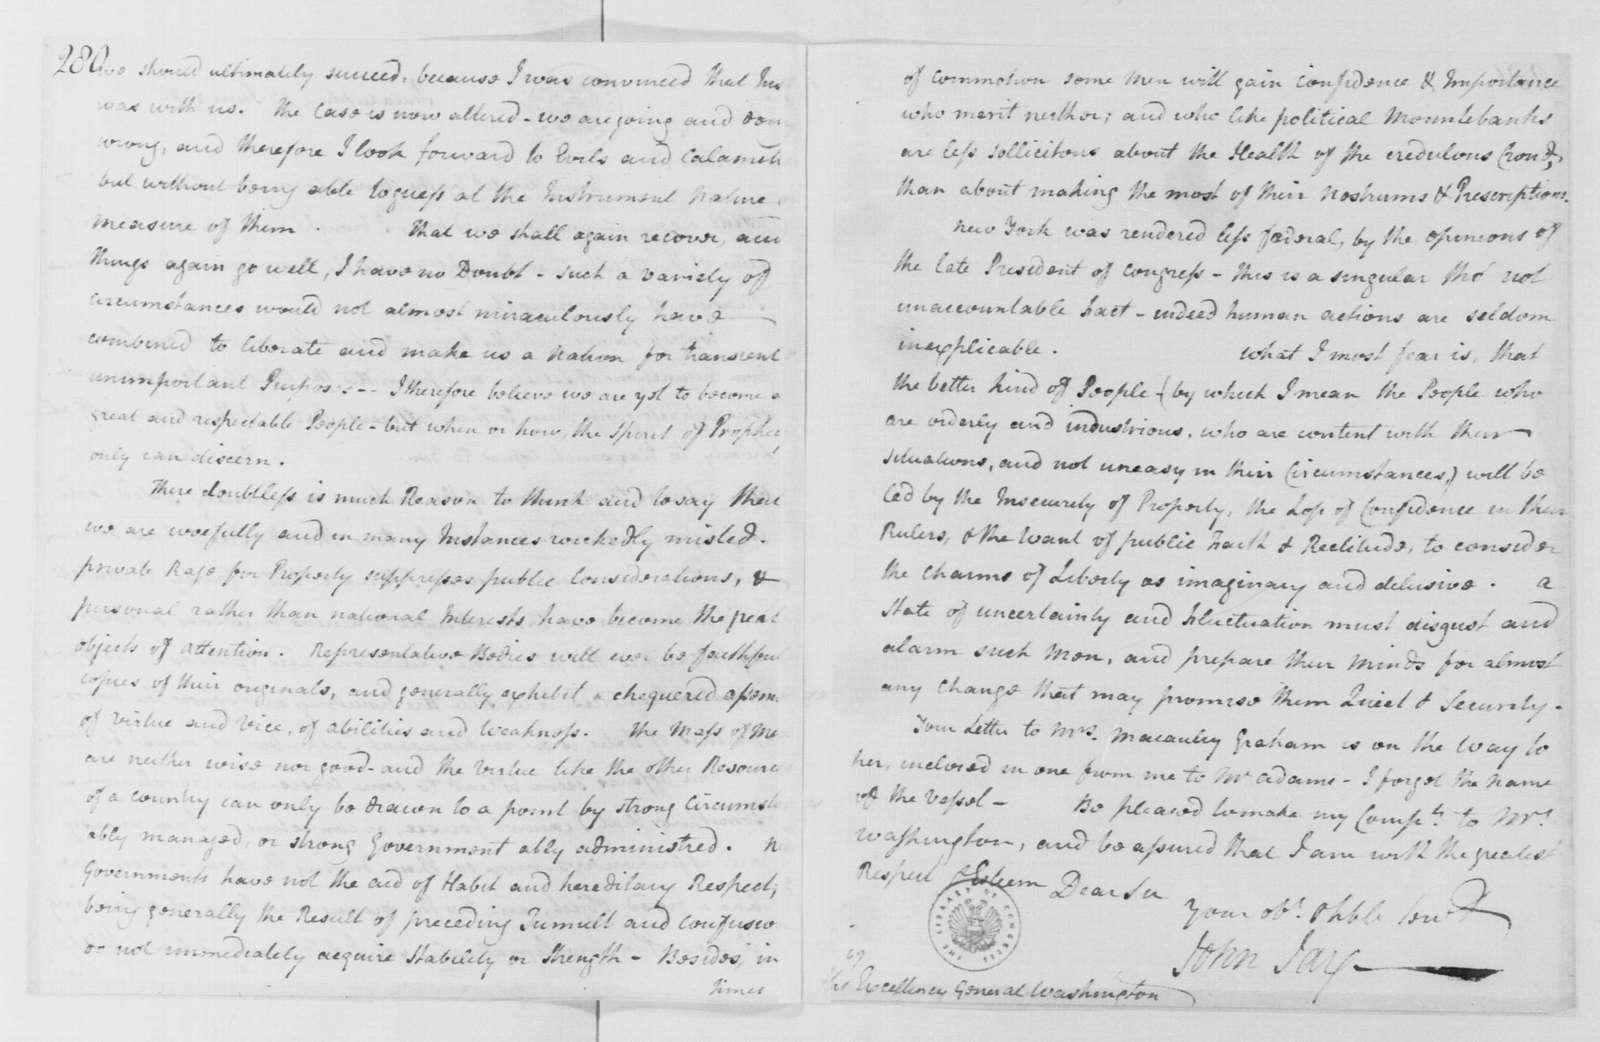 George Washington Papers, Series 4, General Correspondence: John Jay to George Washington, June 27, 1786